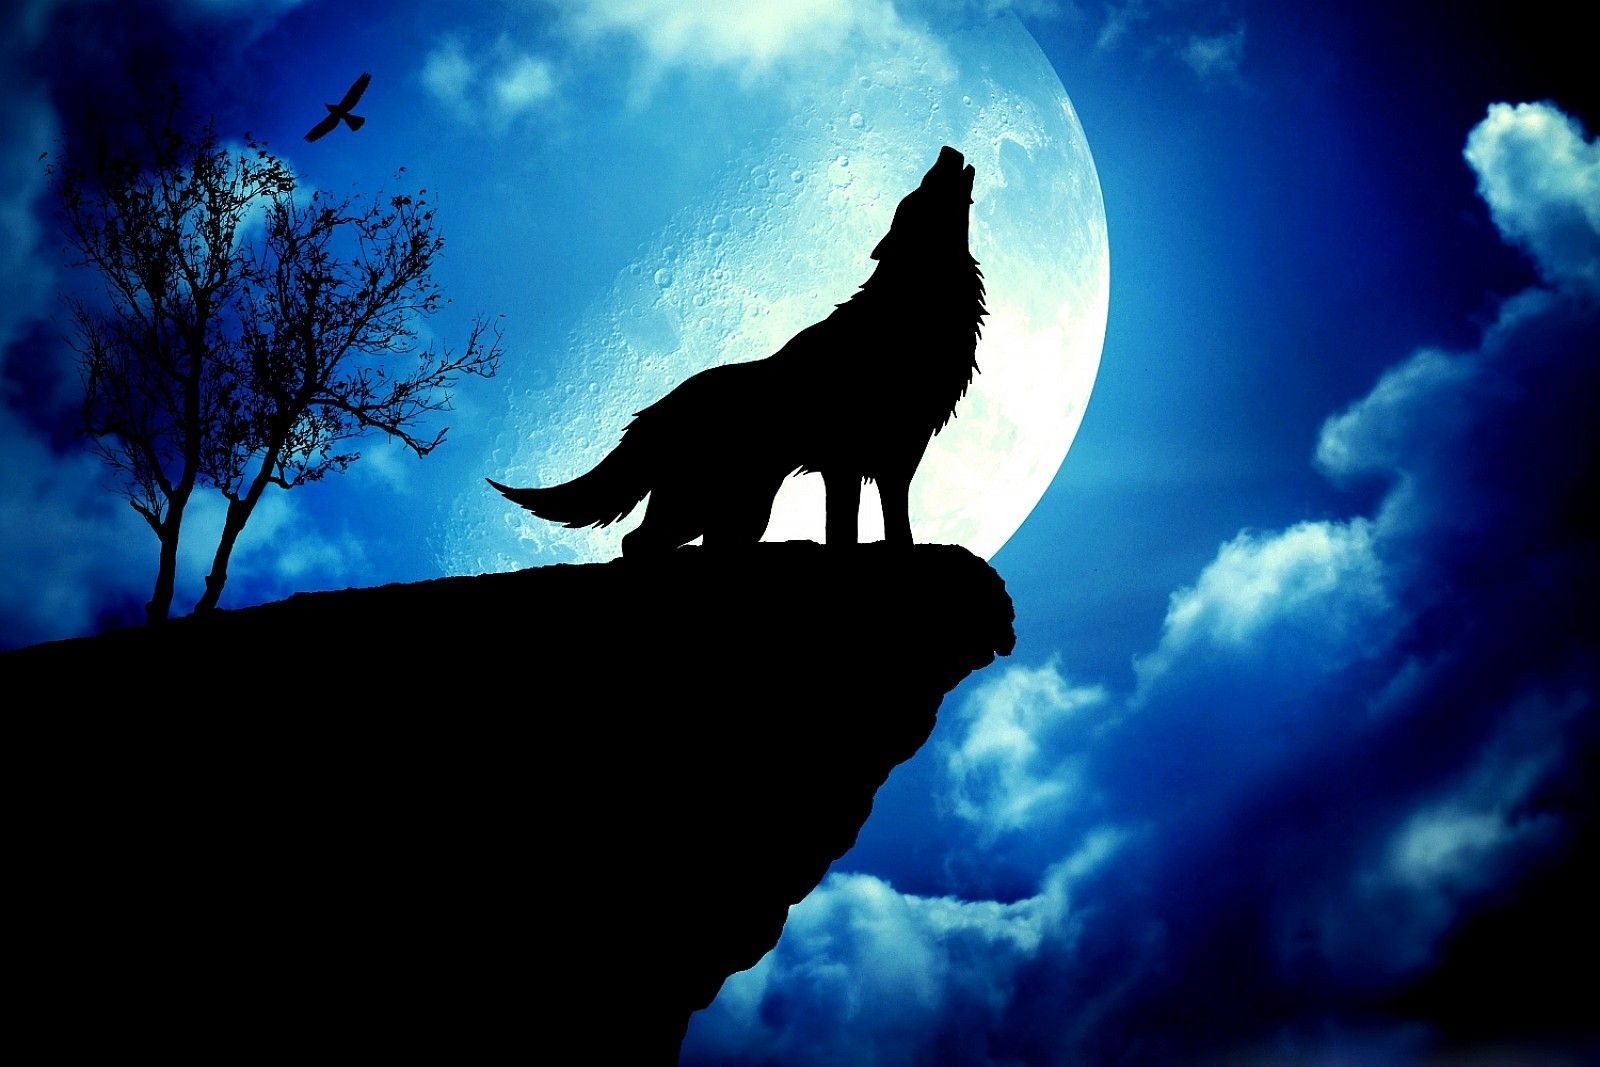 Galaxy Silhouette Wolf